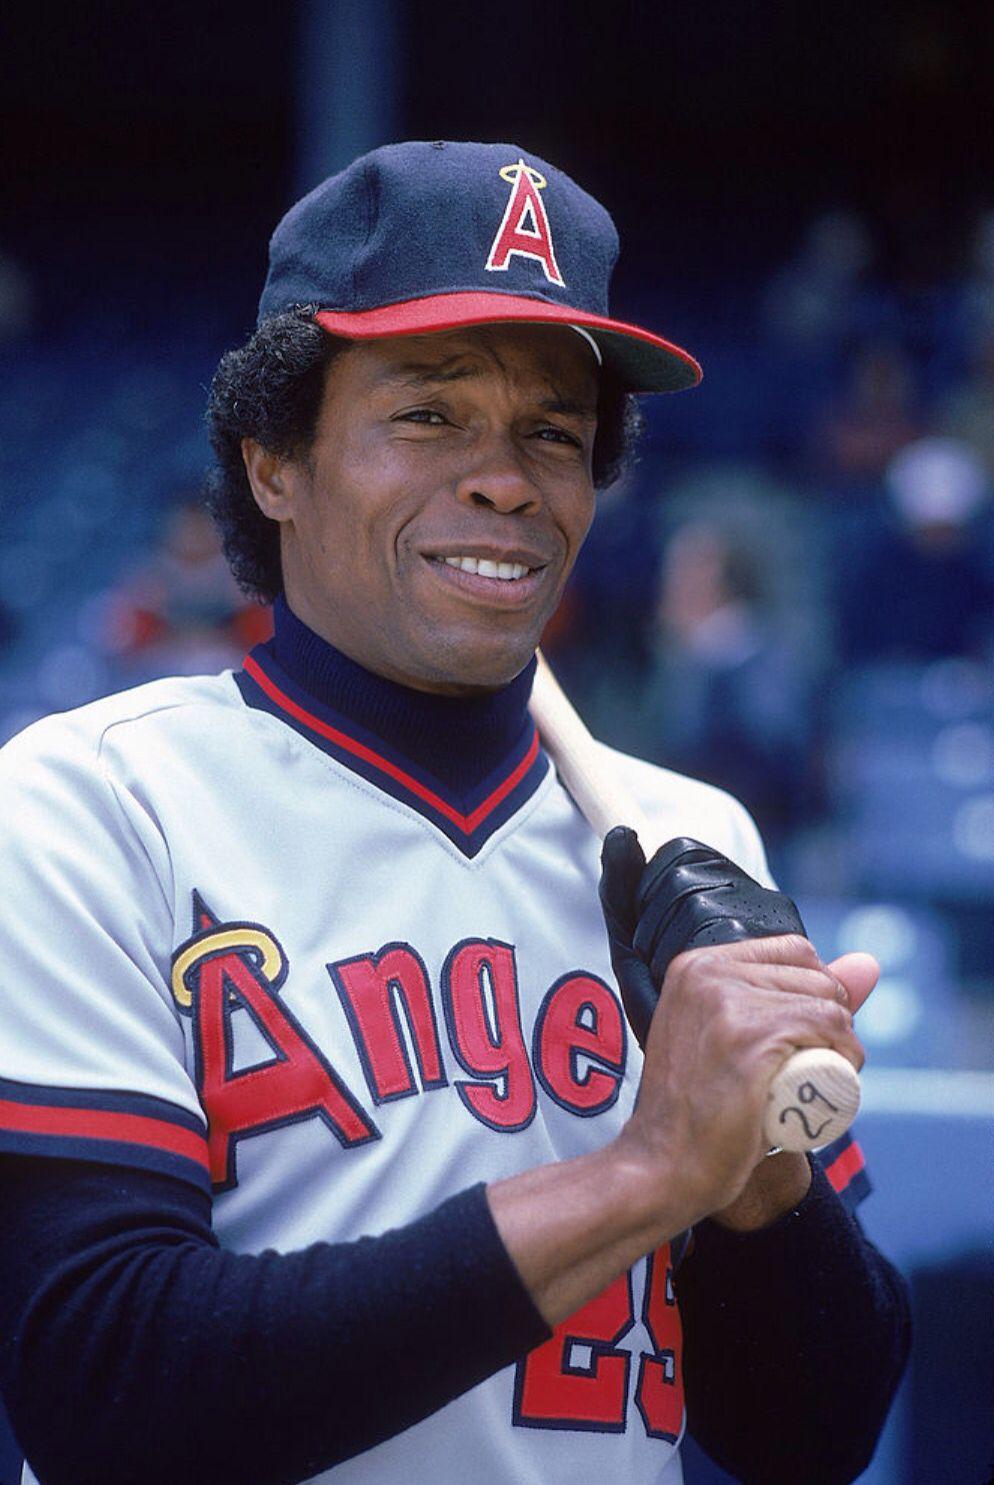 Rod Carew Anaheim angels baseball, Angels baseball, Rod